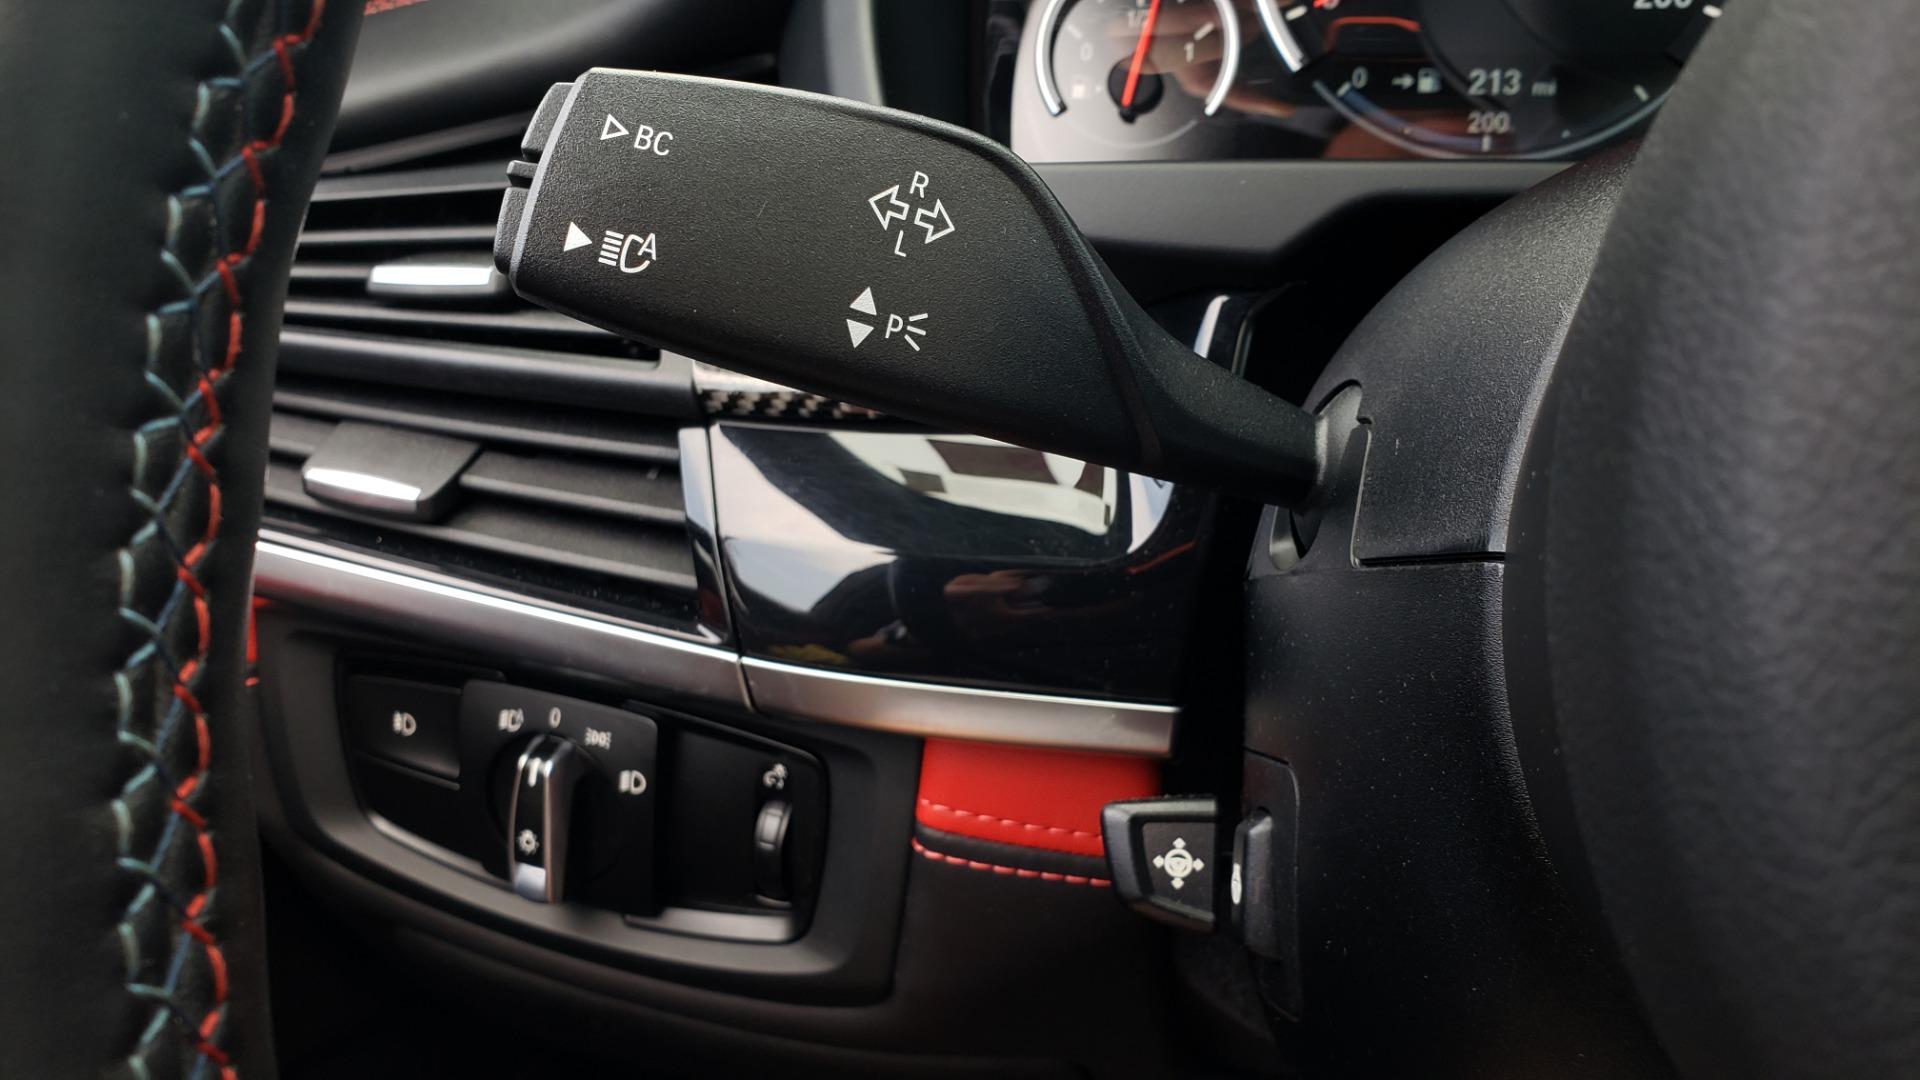 Used 2017 BMW X5 M EXECUTIVE PKG / NAV / DRVR ASST / BSM / HUD / HTD STS / WIFI for sale Sold at Formula Imports in Charlotte NC 28227 42